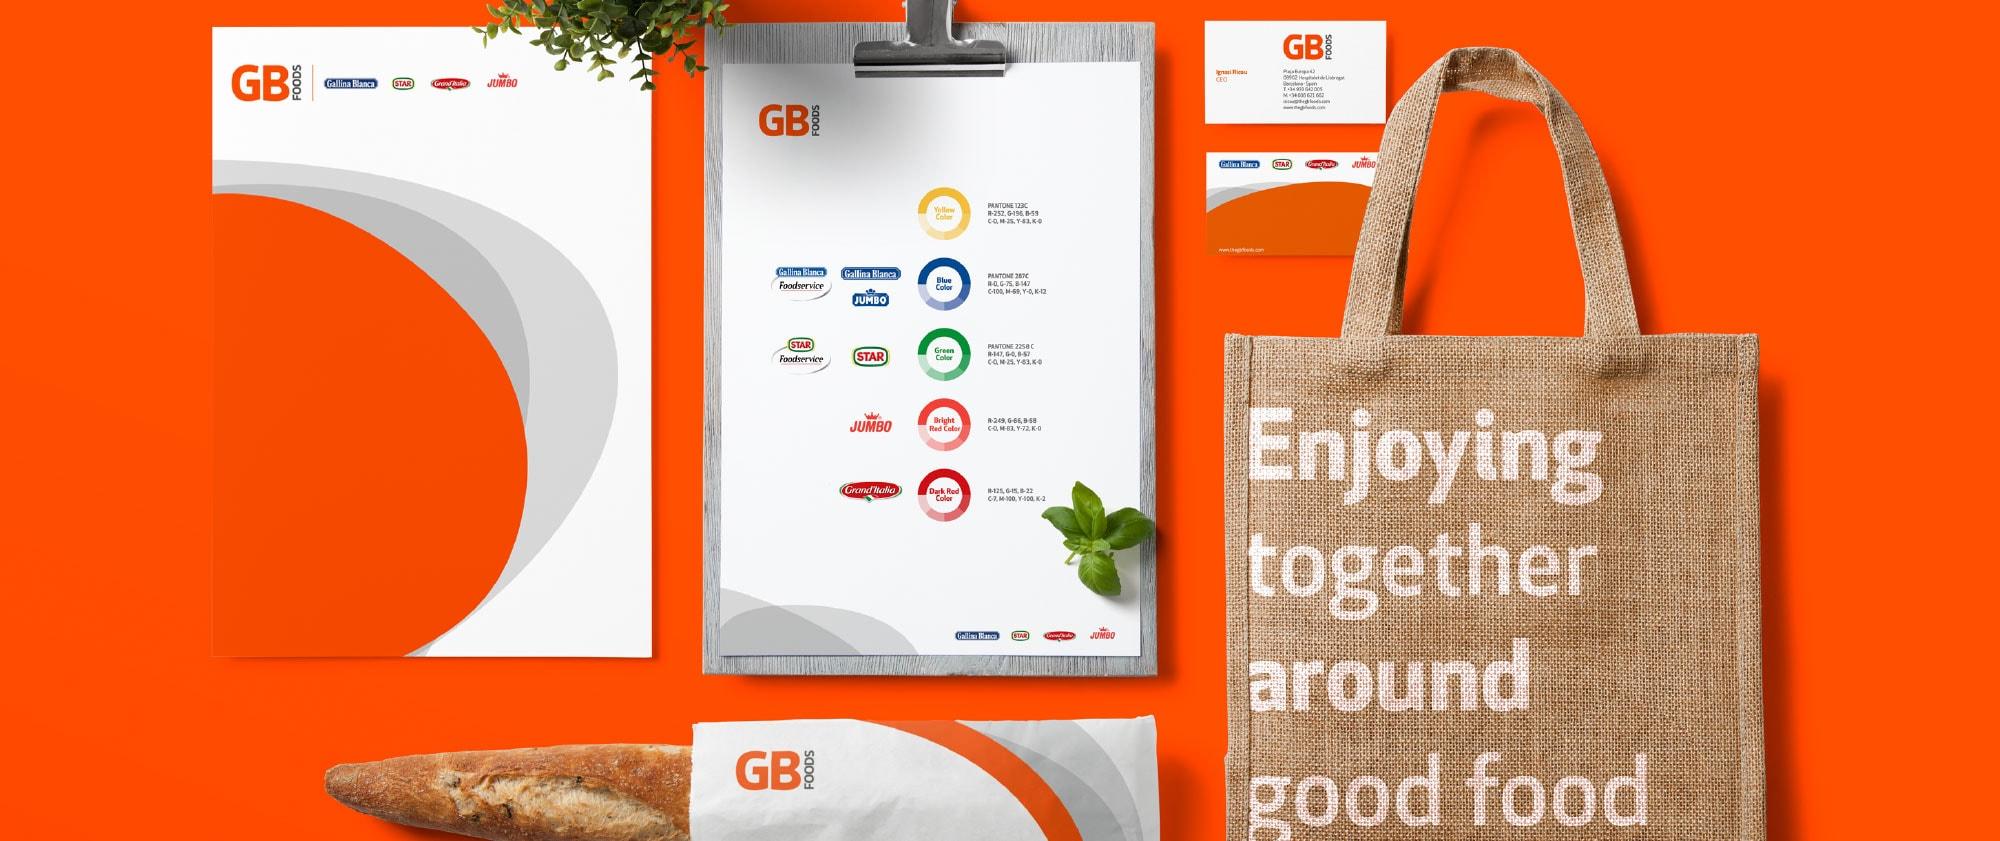 Diseño piezas GB Foods